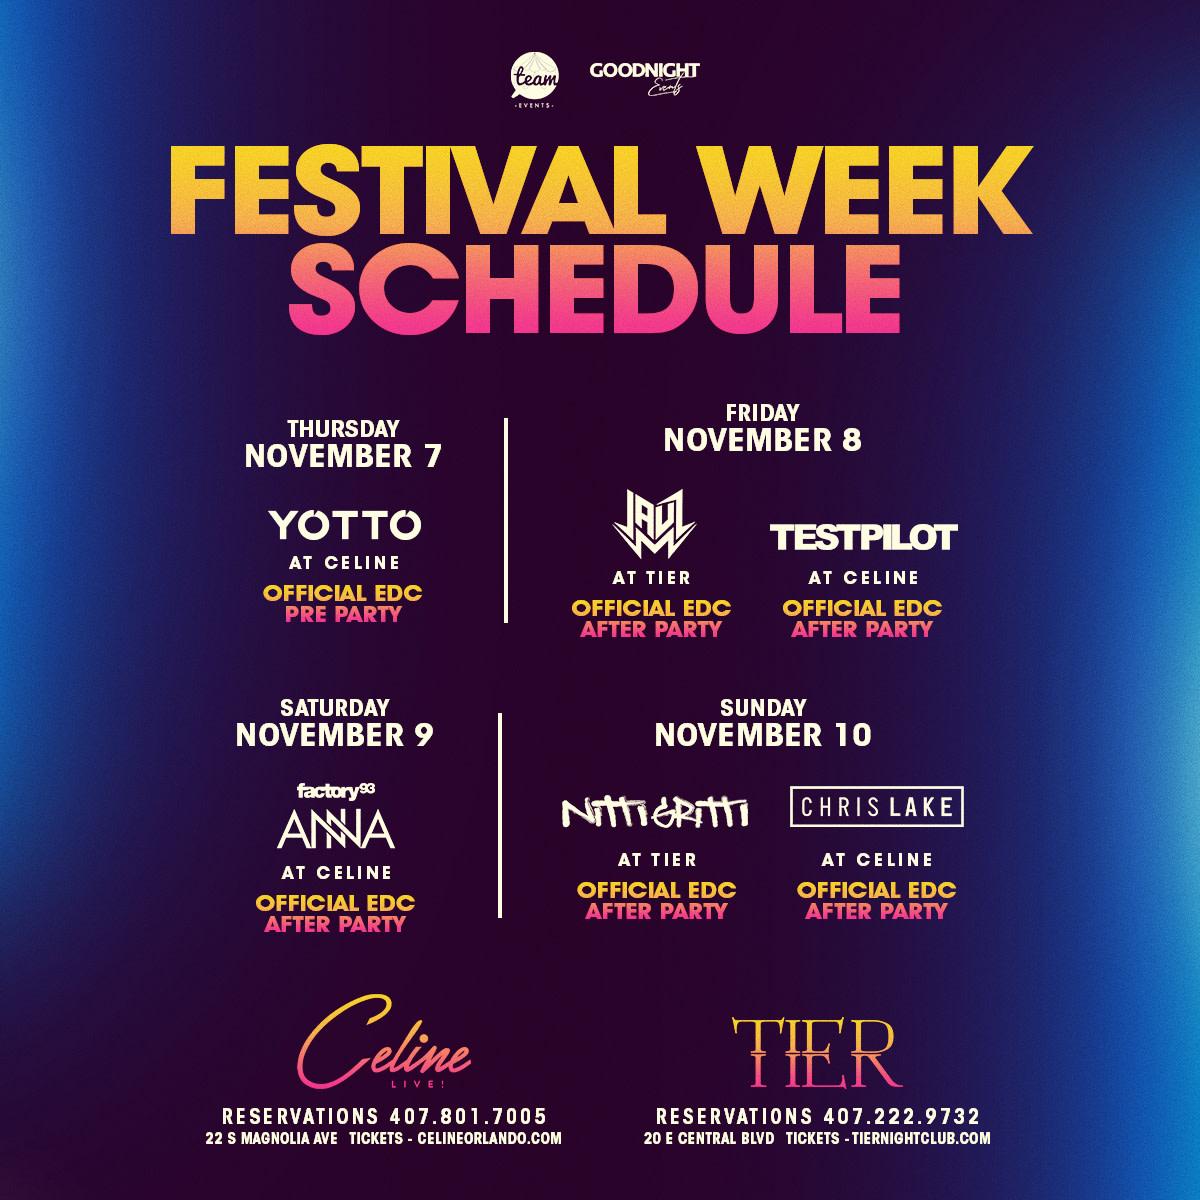 EDC Orlando - Official Afterparty Schedule (YOTTO, Jauz, Testpilot, Nitti Gritti, Chris Lake)